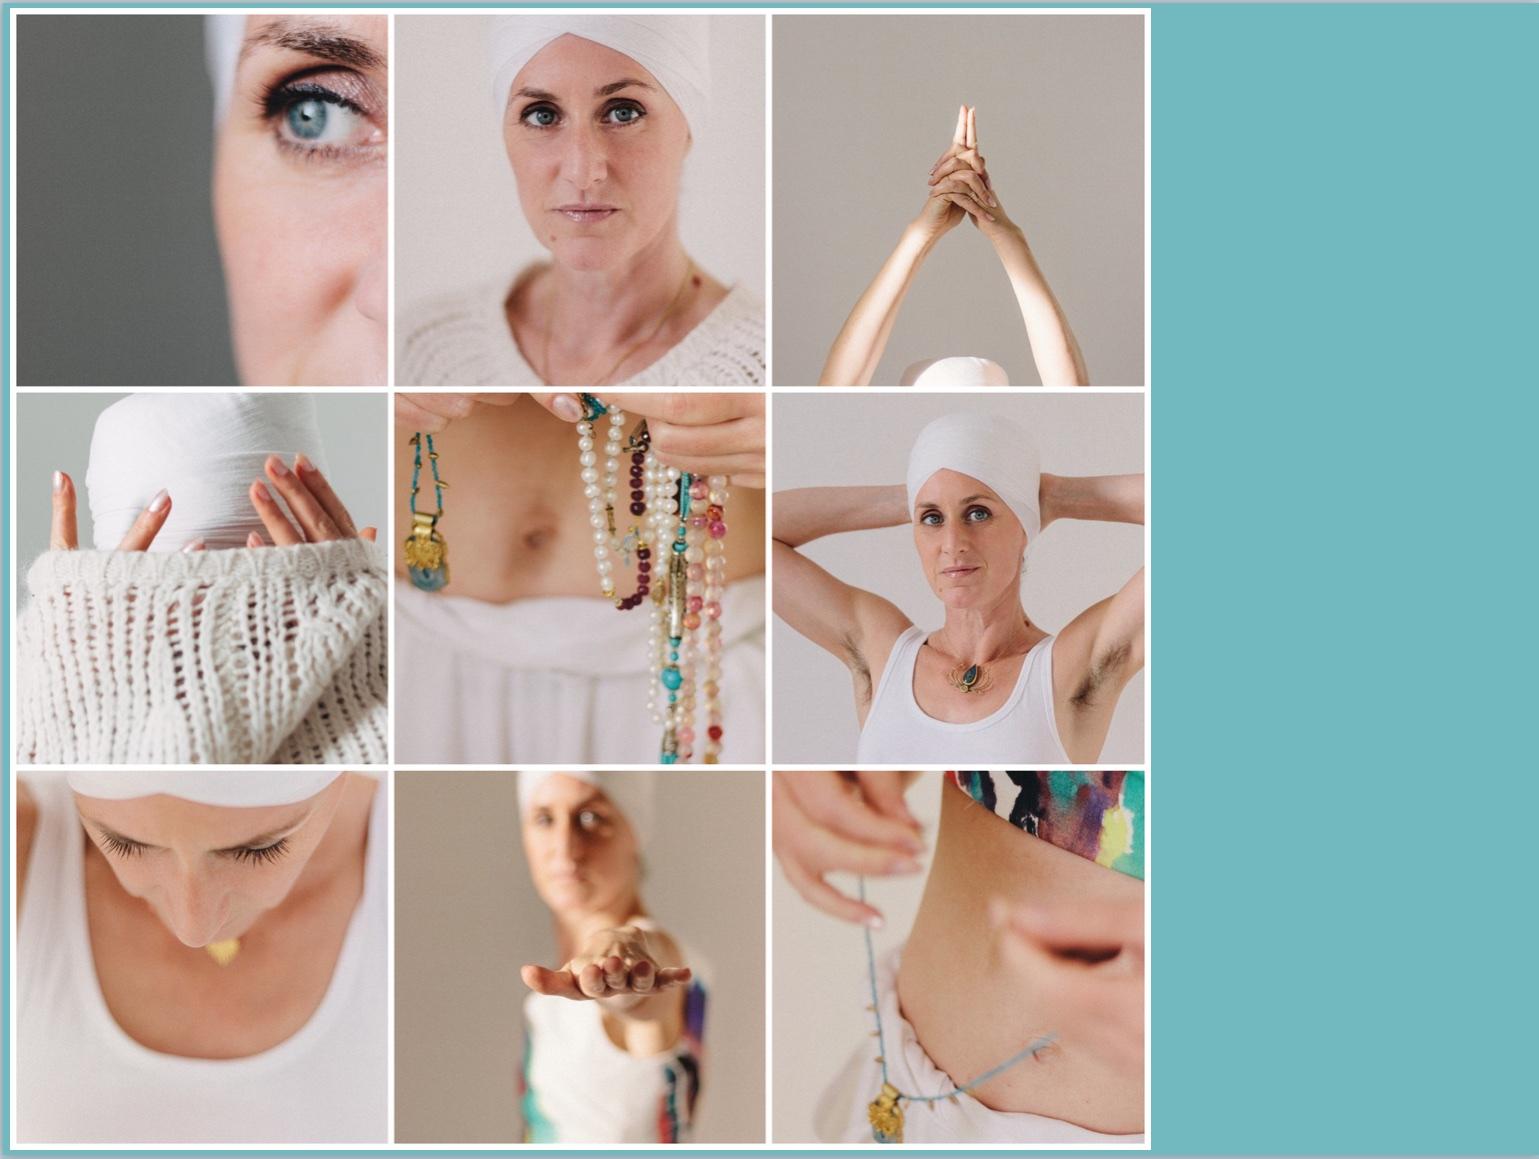 greenwich portrait and branding photography london yoga photographer.jpg